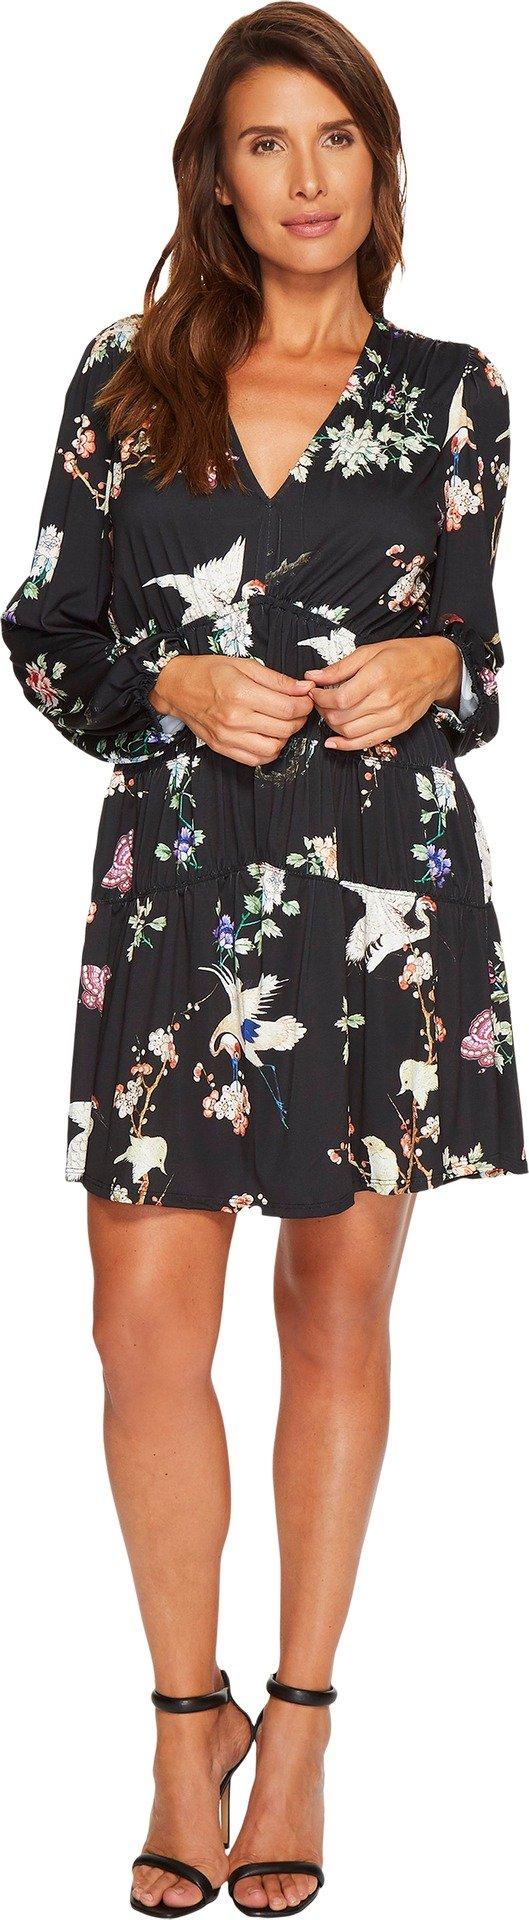 Hale Bob Women's Natural Charm Fine Microfiber Jersey Dress Black Large